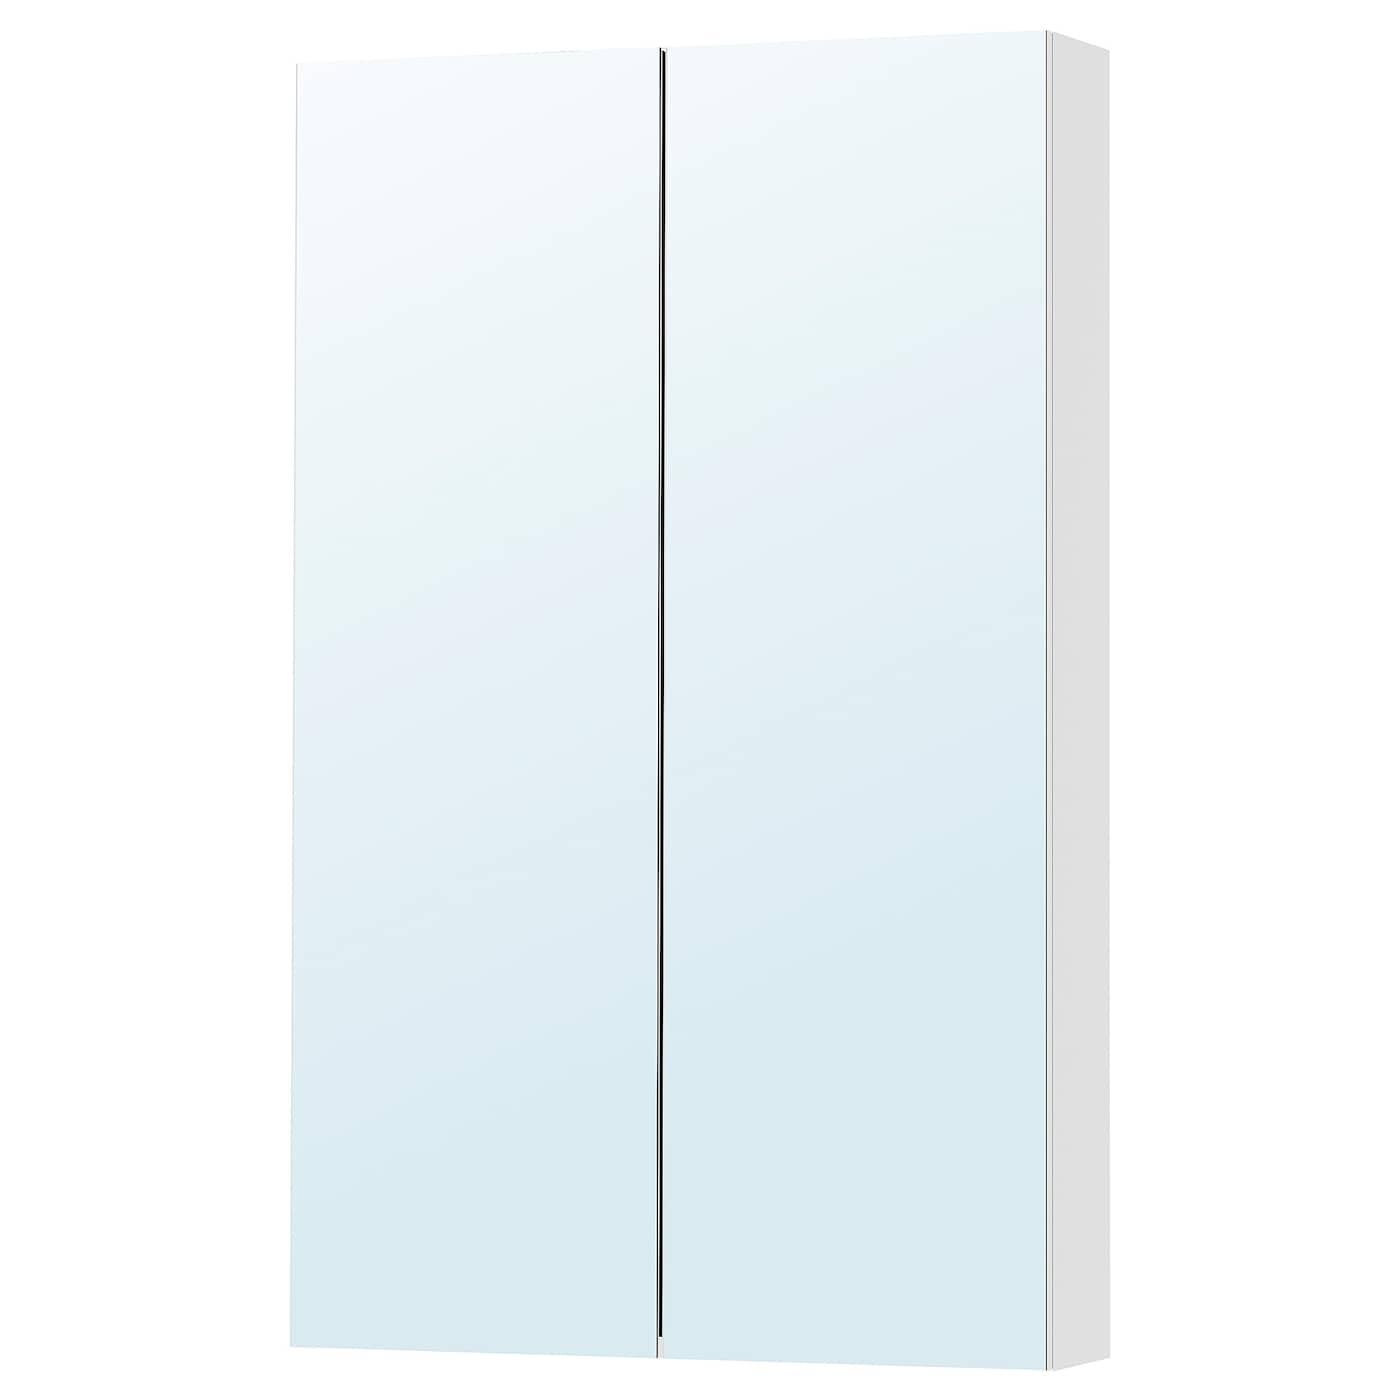 Godmorgon Mirror Cabinet With 2 Doors 23 5 8x5 1 2x37 3 4 Ikea